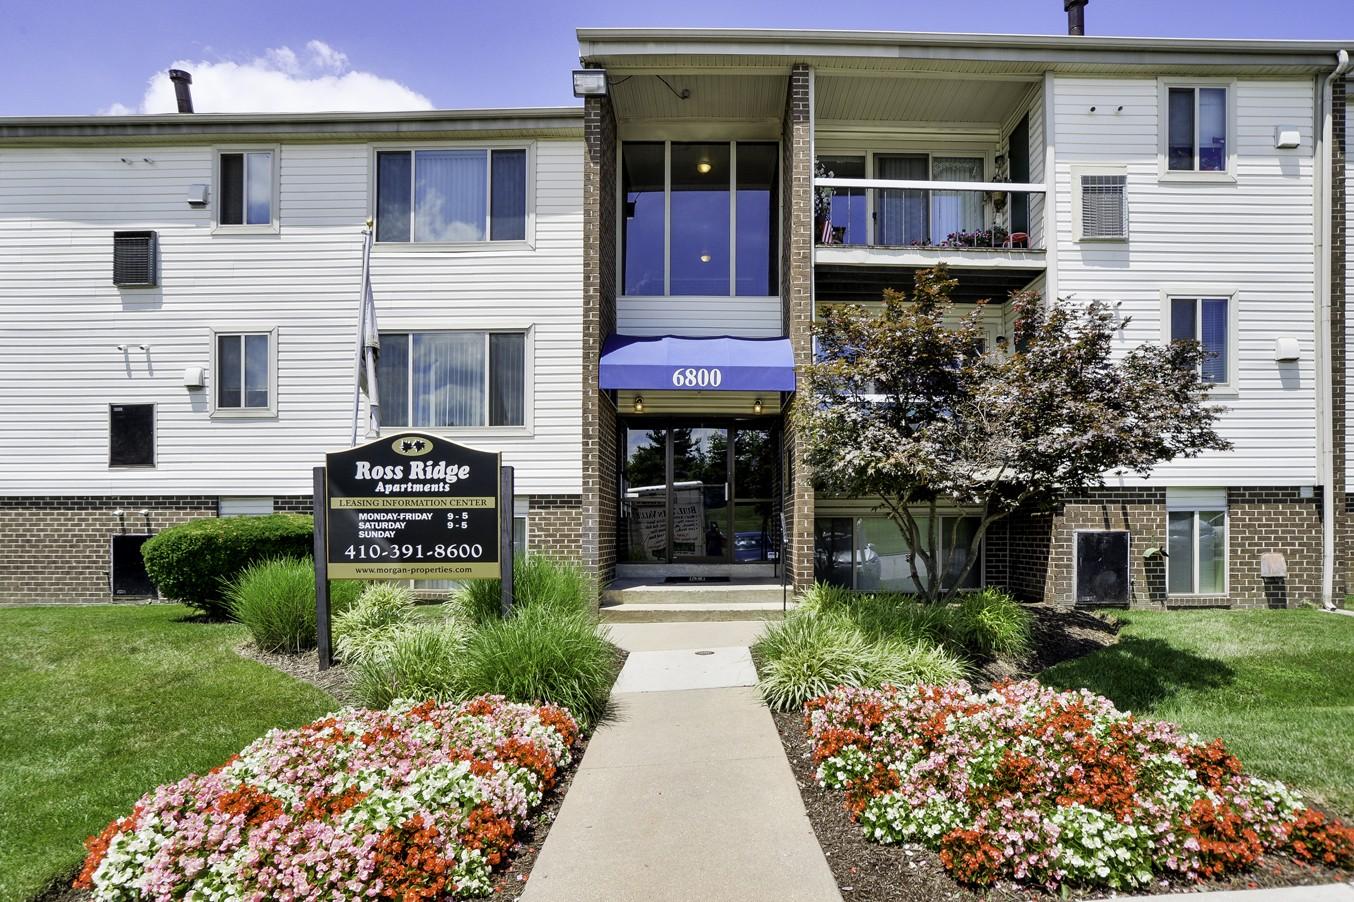 Ross Ridge Apartment Homes